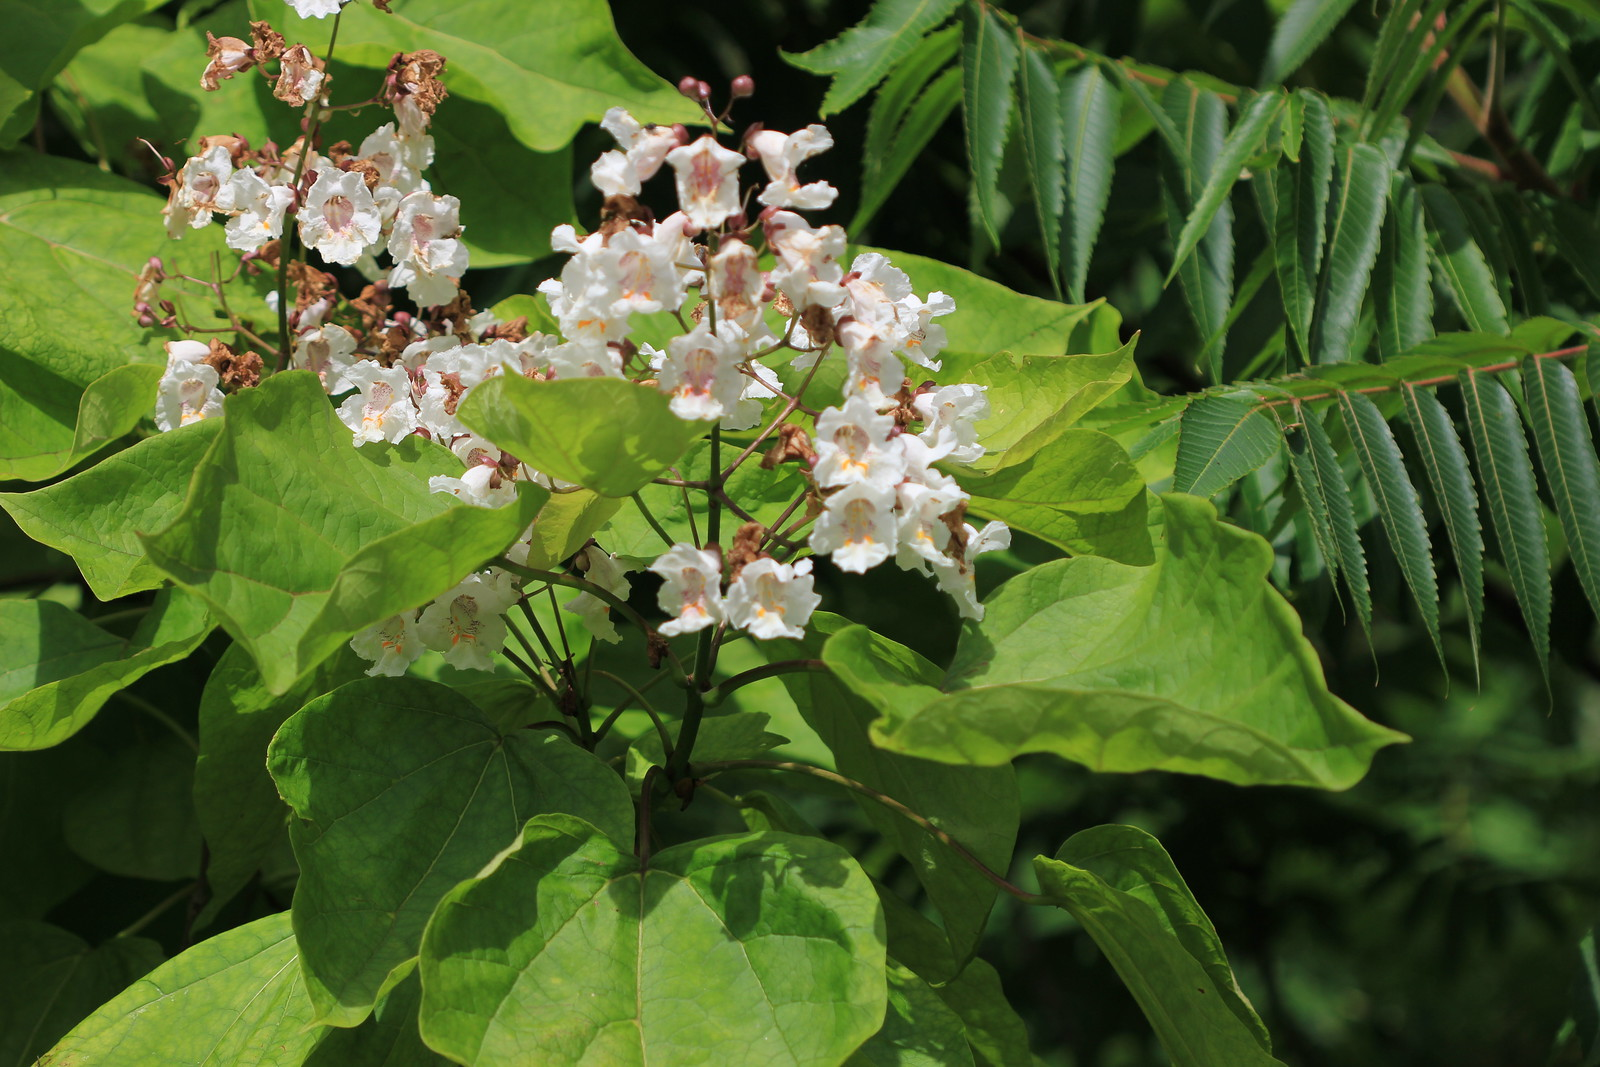 Flowering India Bean Tree near Ashurst Station